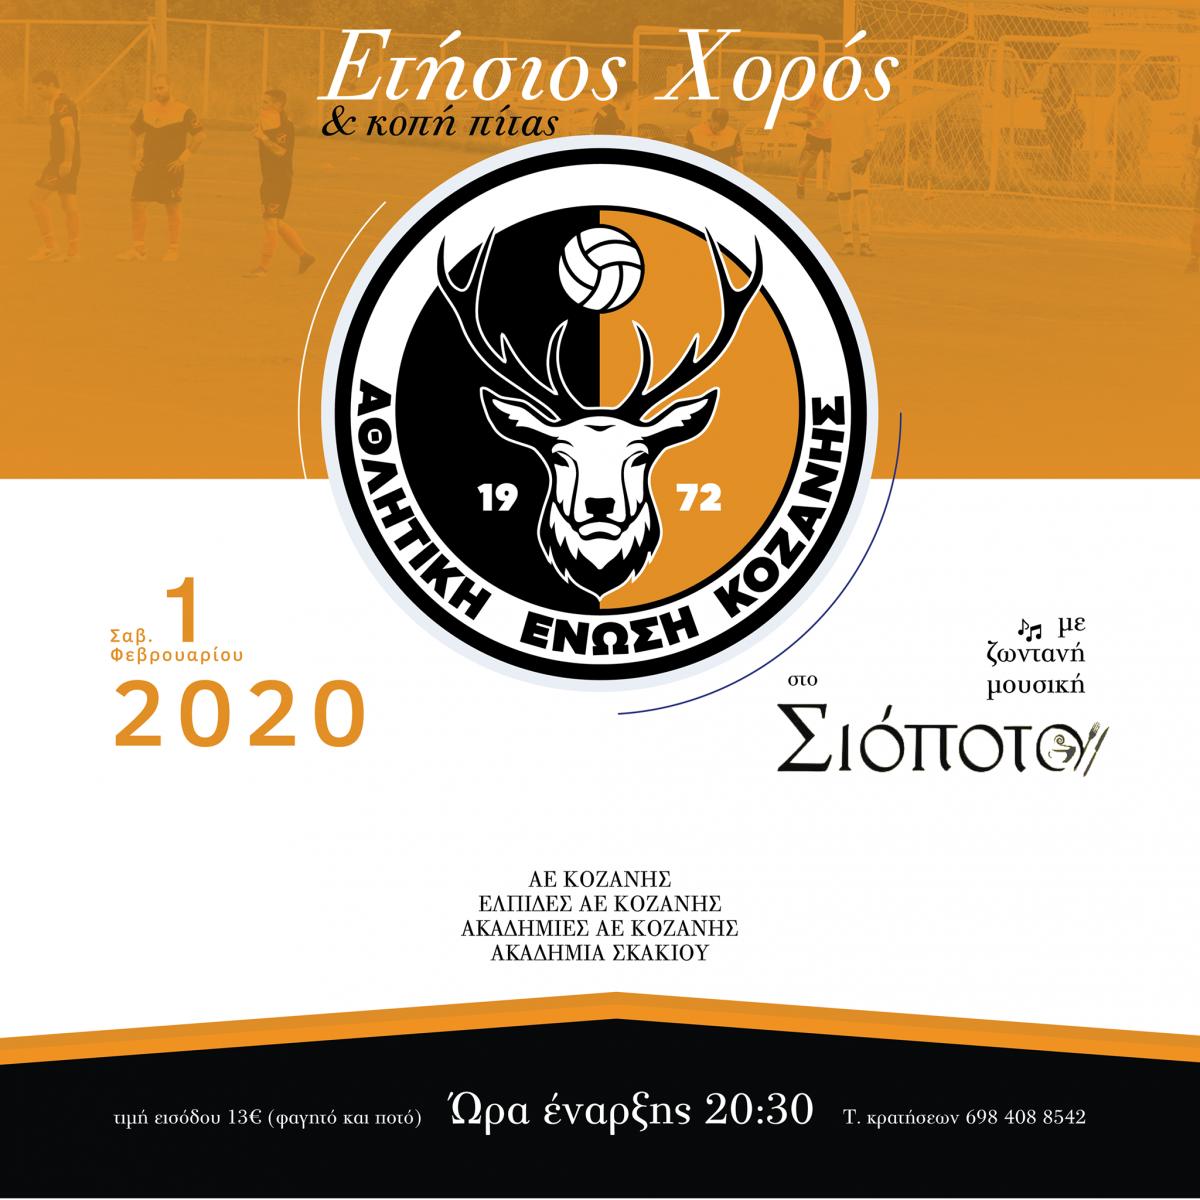 Xoros-AEKozanis-1-2-2020-Afisa.png